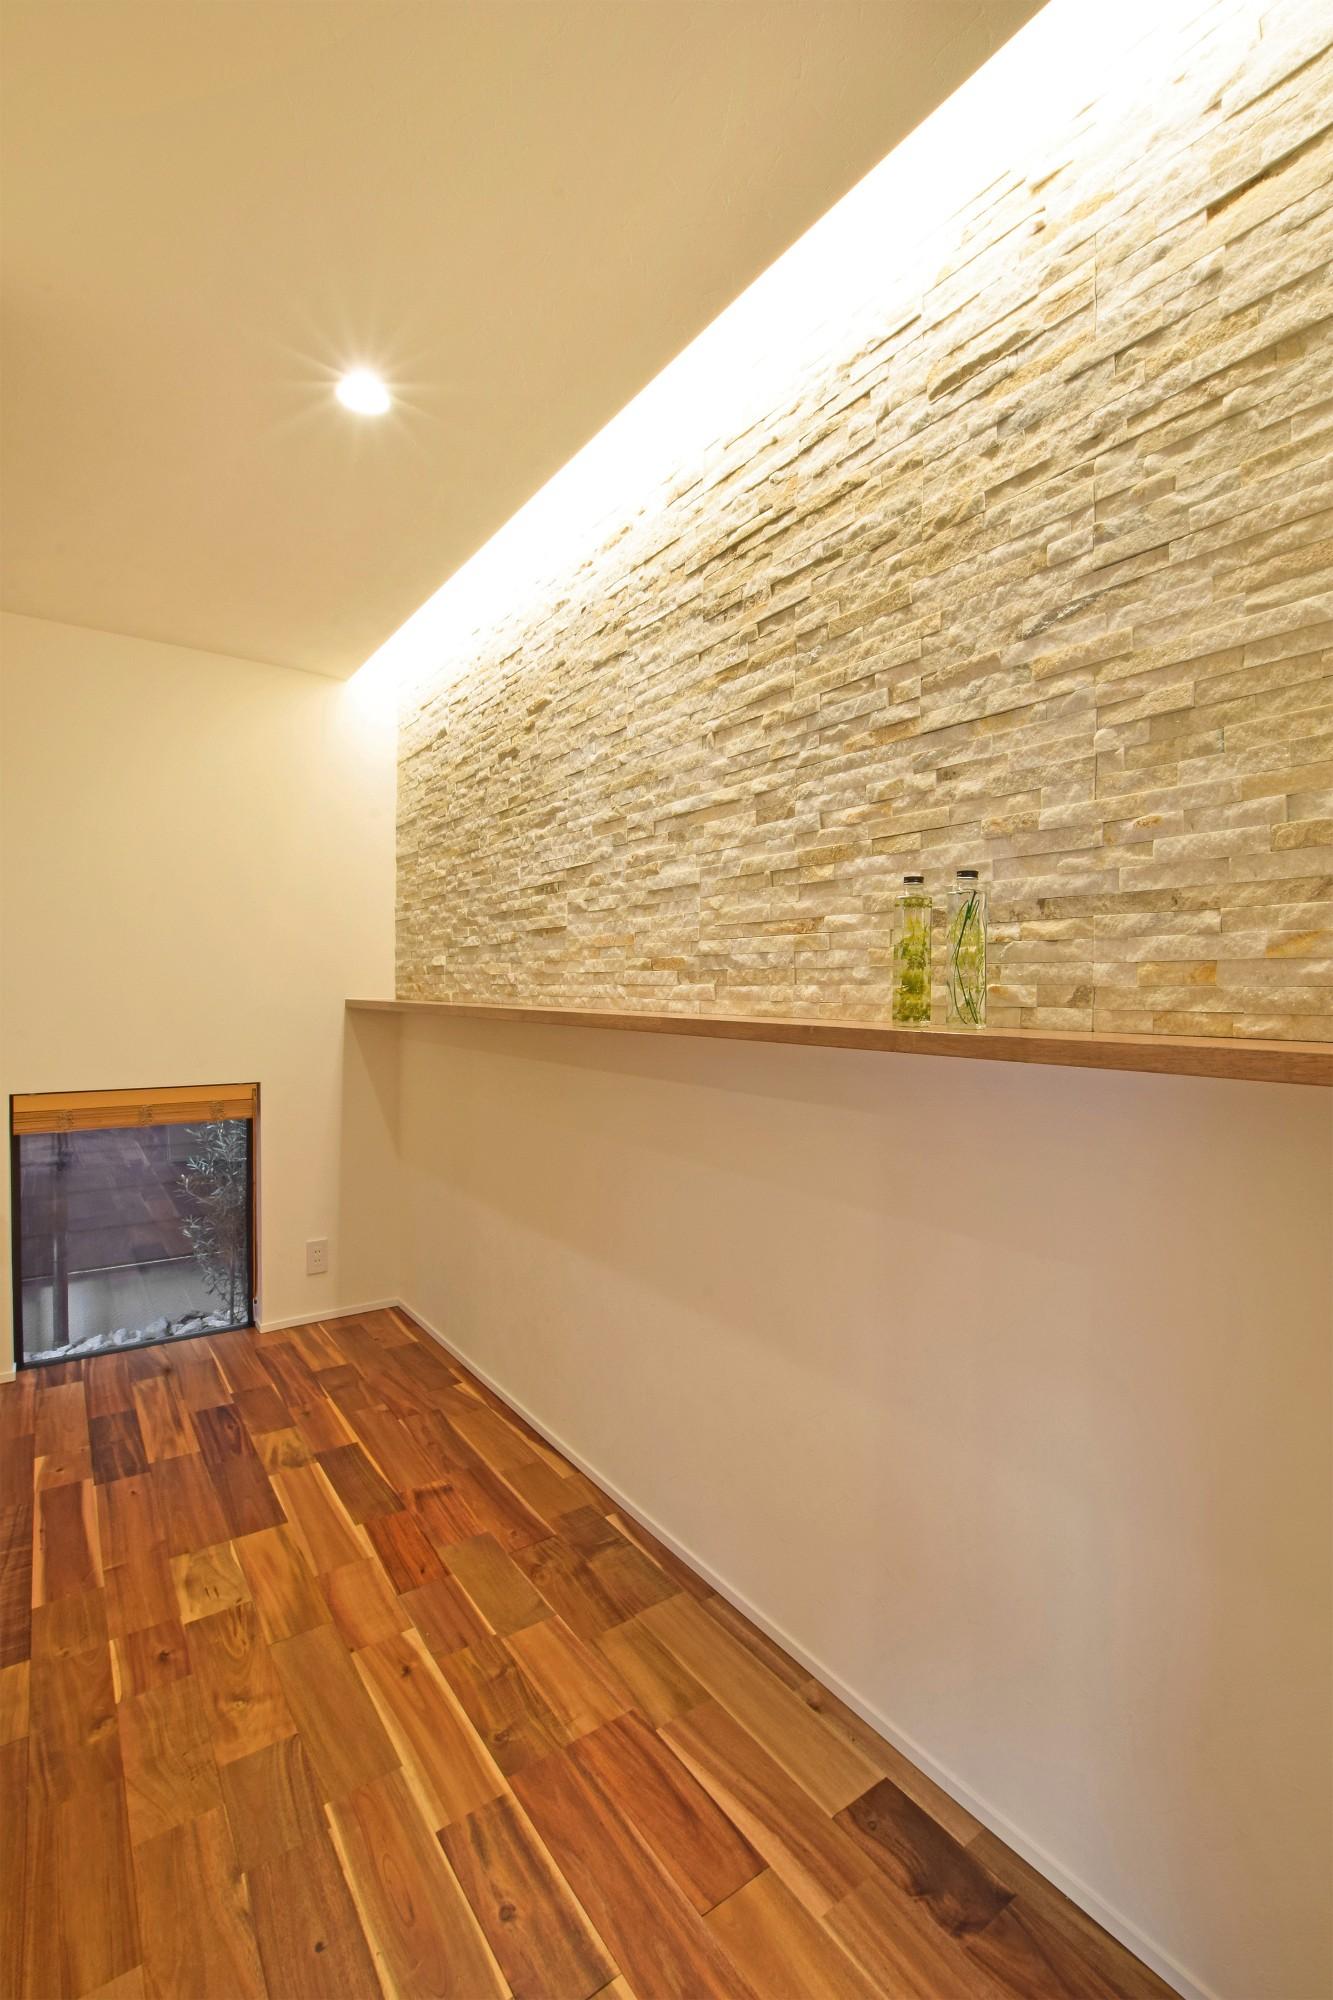 DETAIL HOME(ディテールホーム)「ペットと共生する三世代同居の平屋住宅」のシンプル・ナチュラルな玄関の実例写真